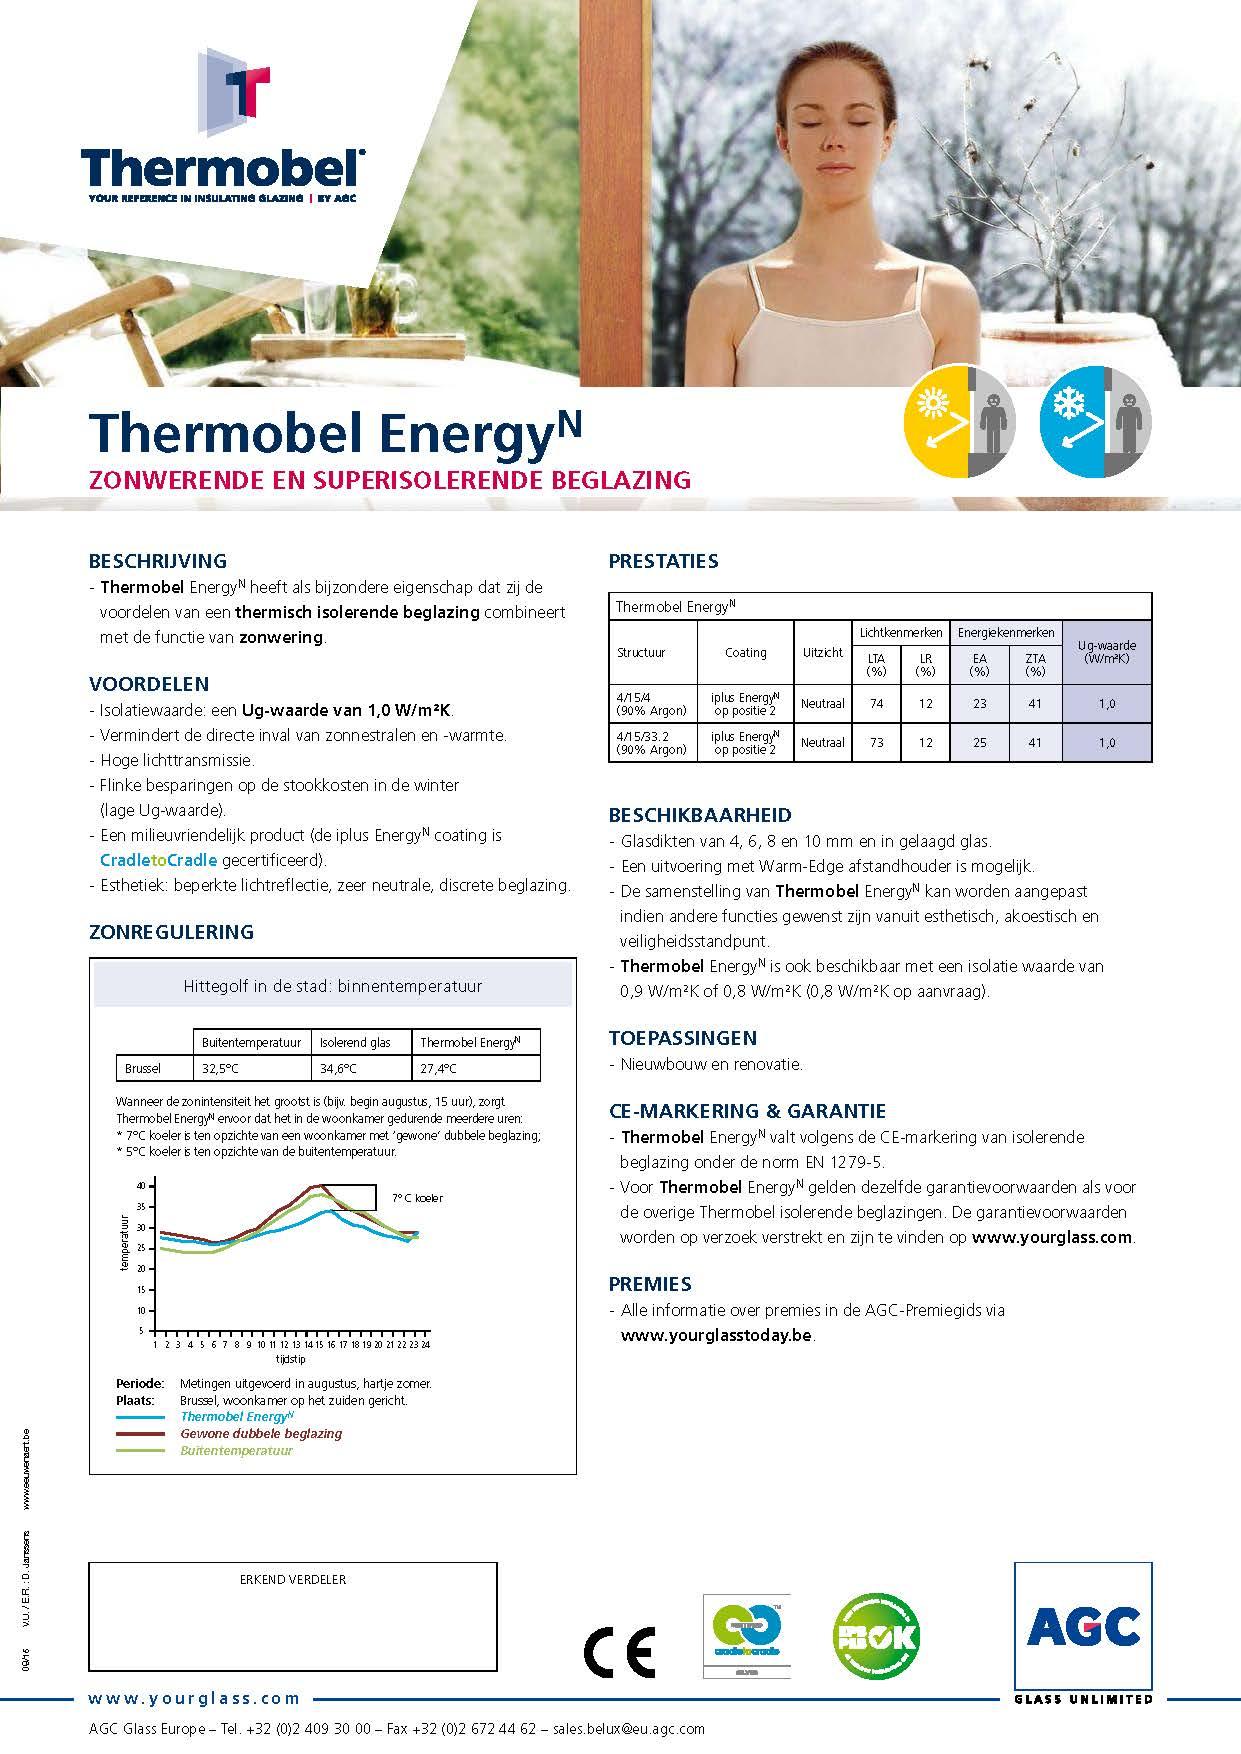 Thermobel-EnergyN